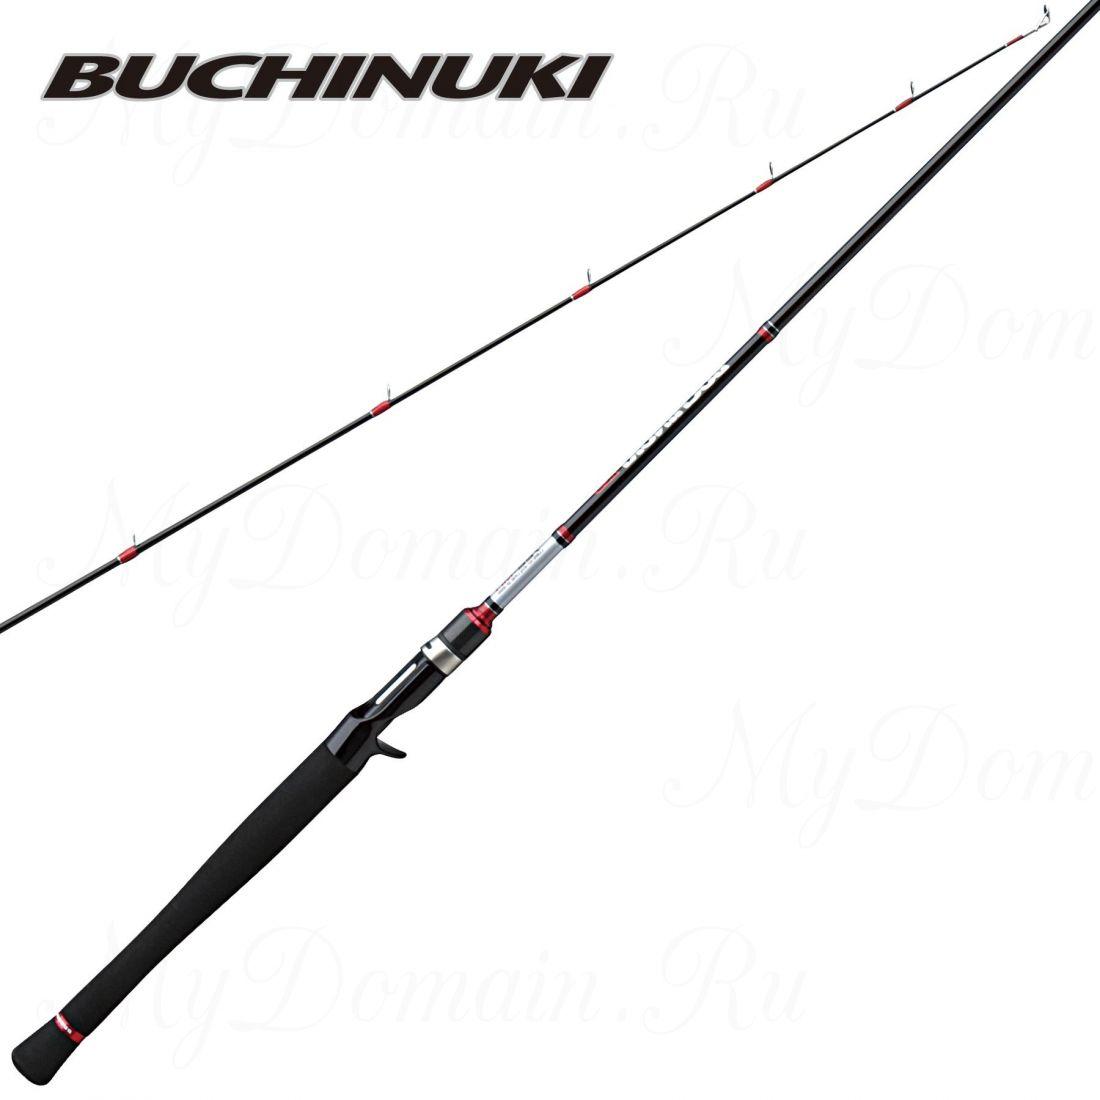 Удилище кастинговое Prox Buchinuki BC-2-782MH 239 cм, 2 секции, 10-40 гр, вес 150 гр, транспортная длина 123,5 см.